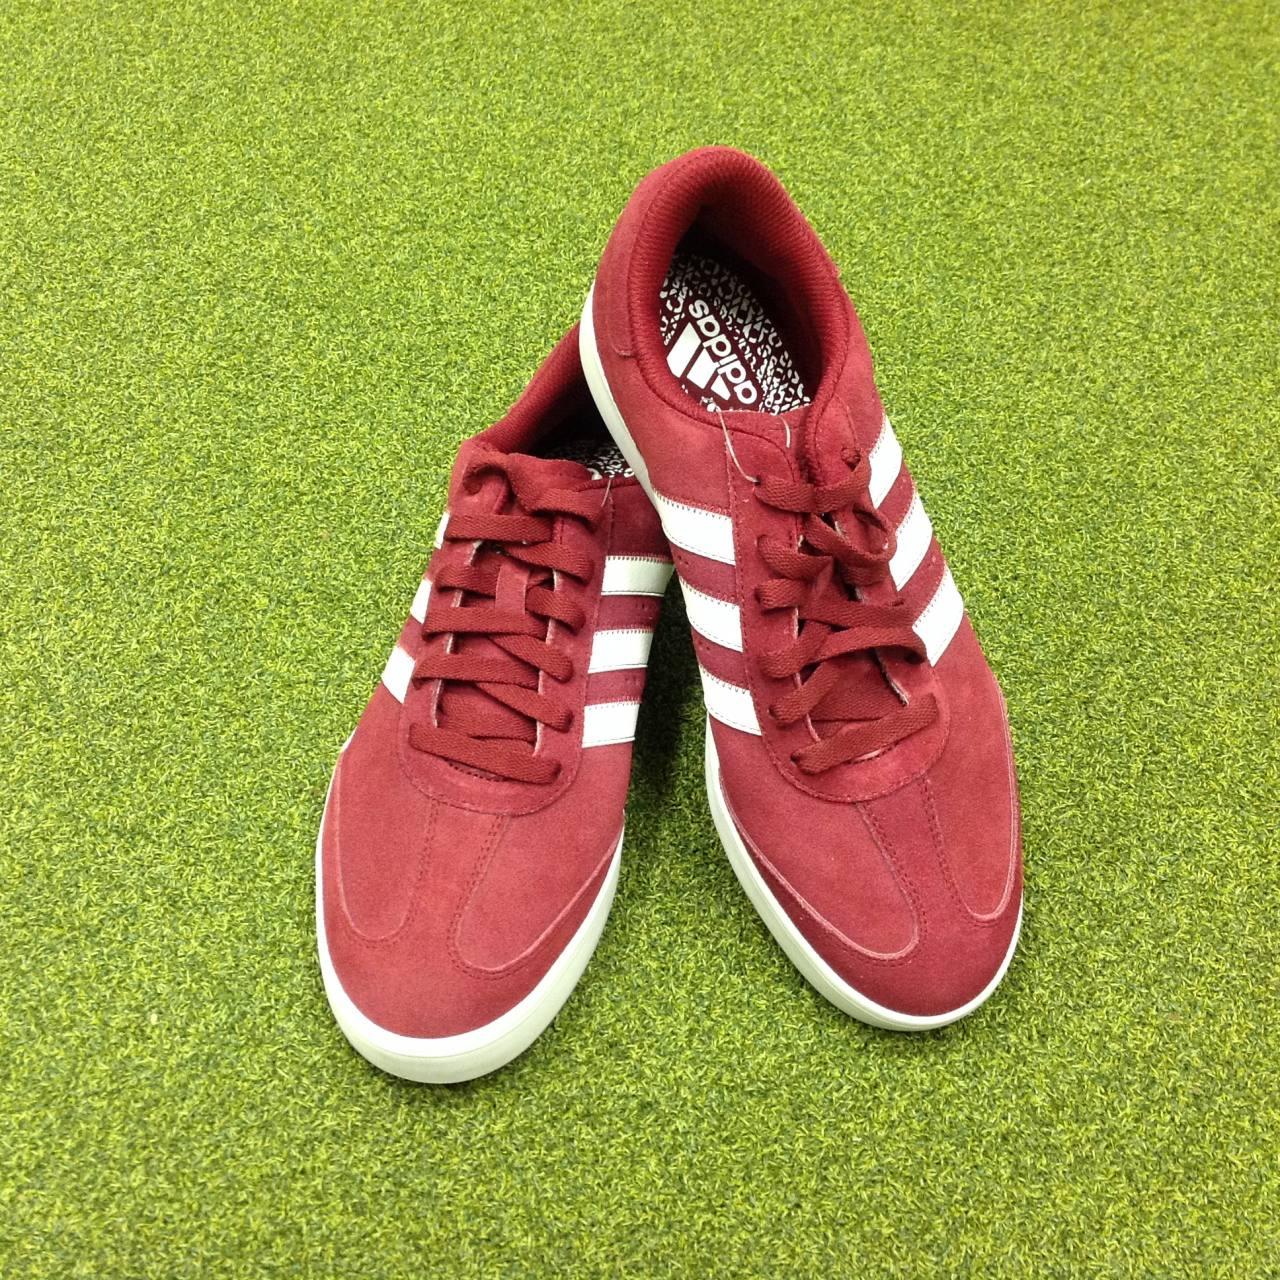 Nuove adidas adicross v scarpe da golf uk dimensioni noi 9 ue 42 2 / 3 su ebay